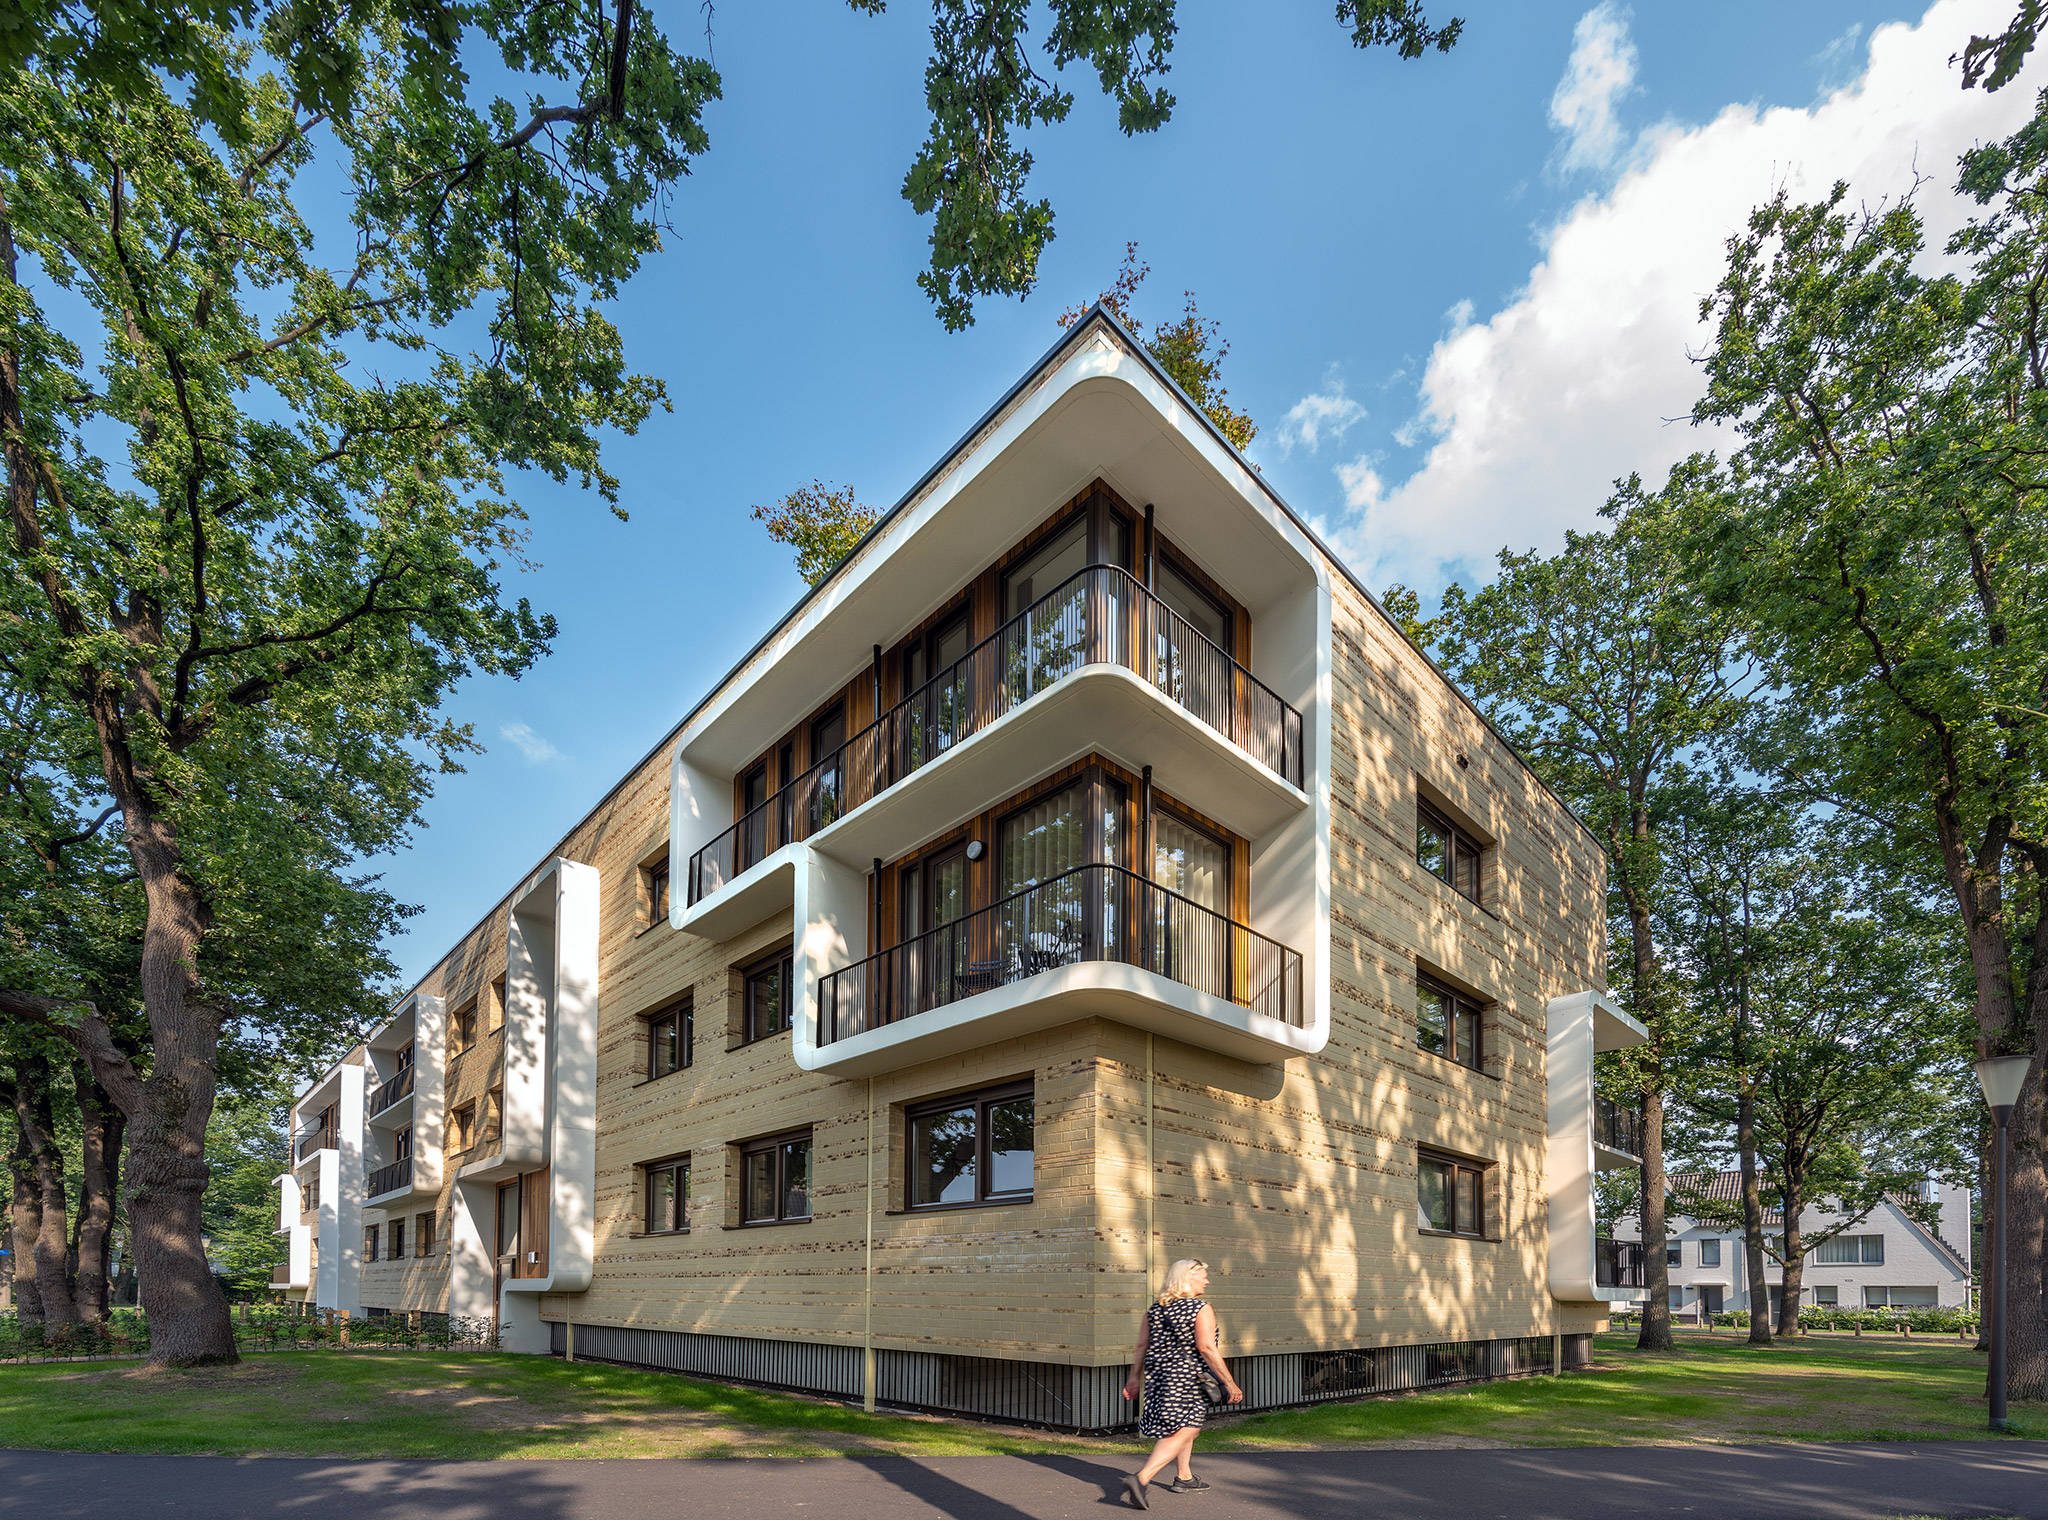 Simone Drost Architecture Planet Lab Architecture Appartementen Stadhouderspark Vught hoek boven balkons